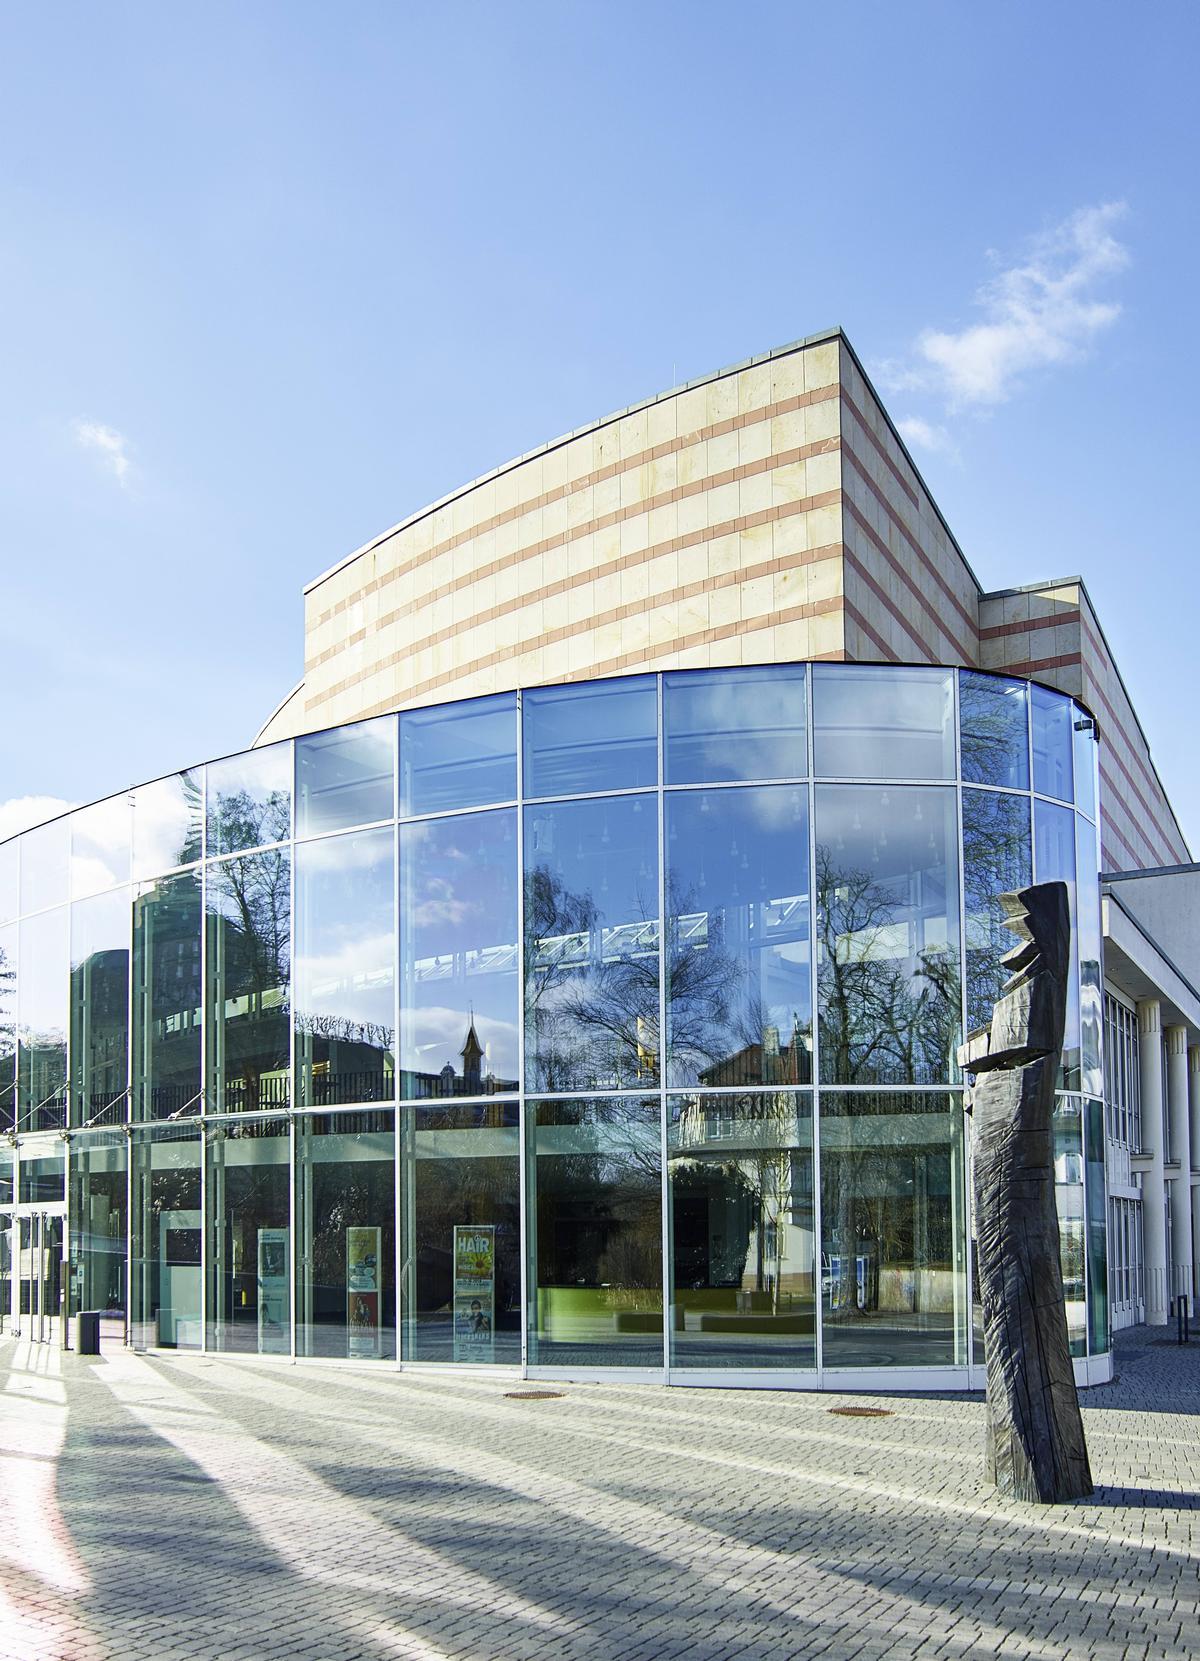 Jubiläumsfest: 25 Jahre Konzerthalle Bamberg